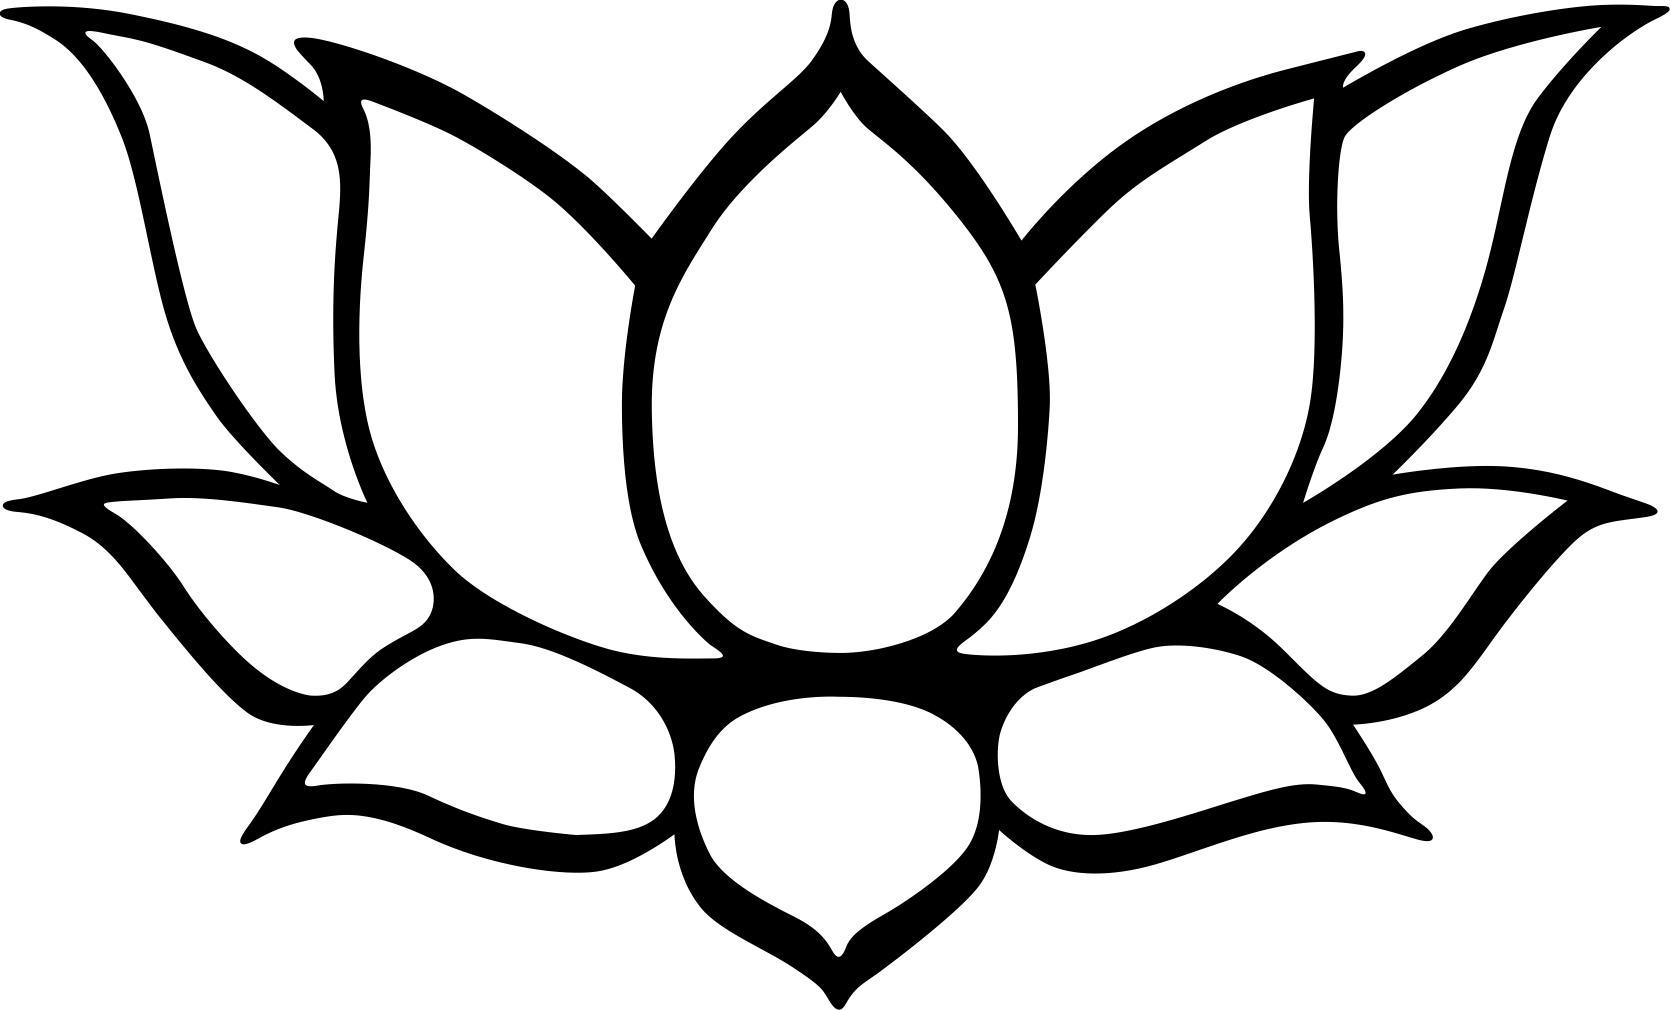 1670x1010 Lotus Flower Clipart